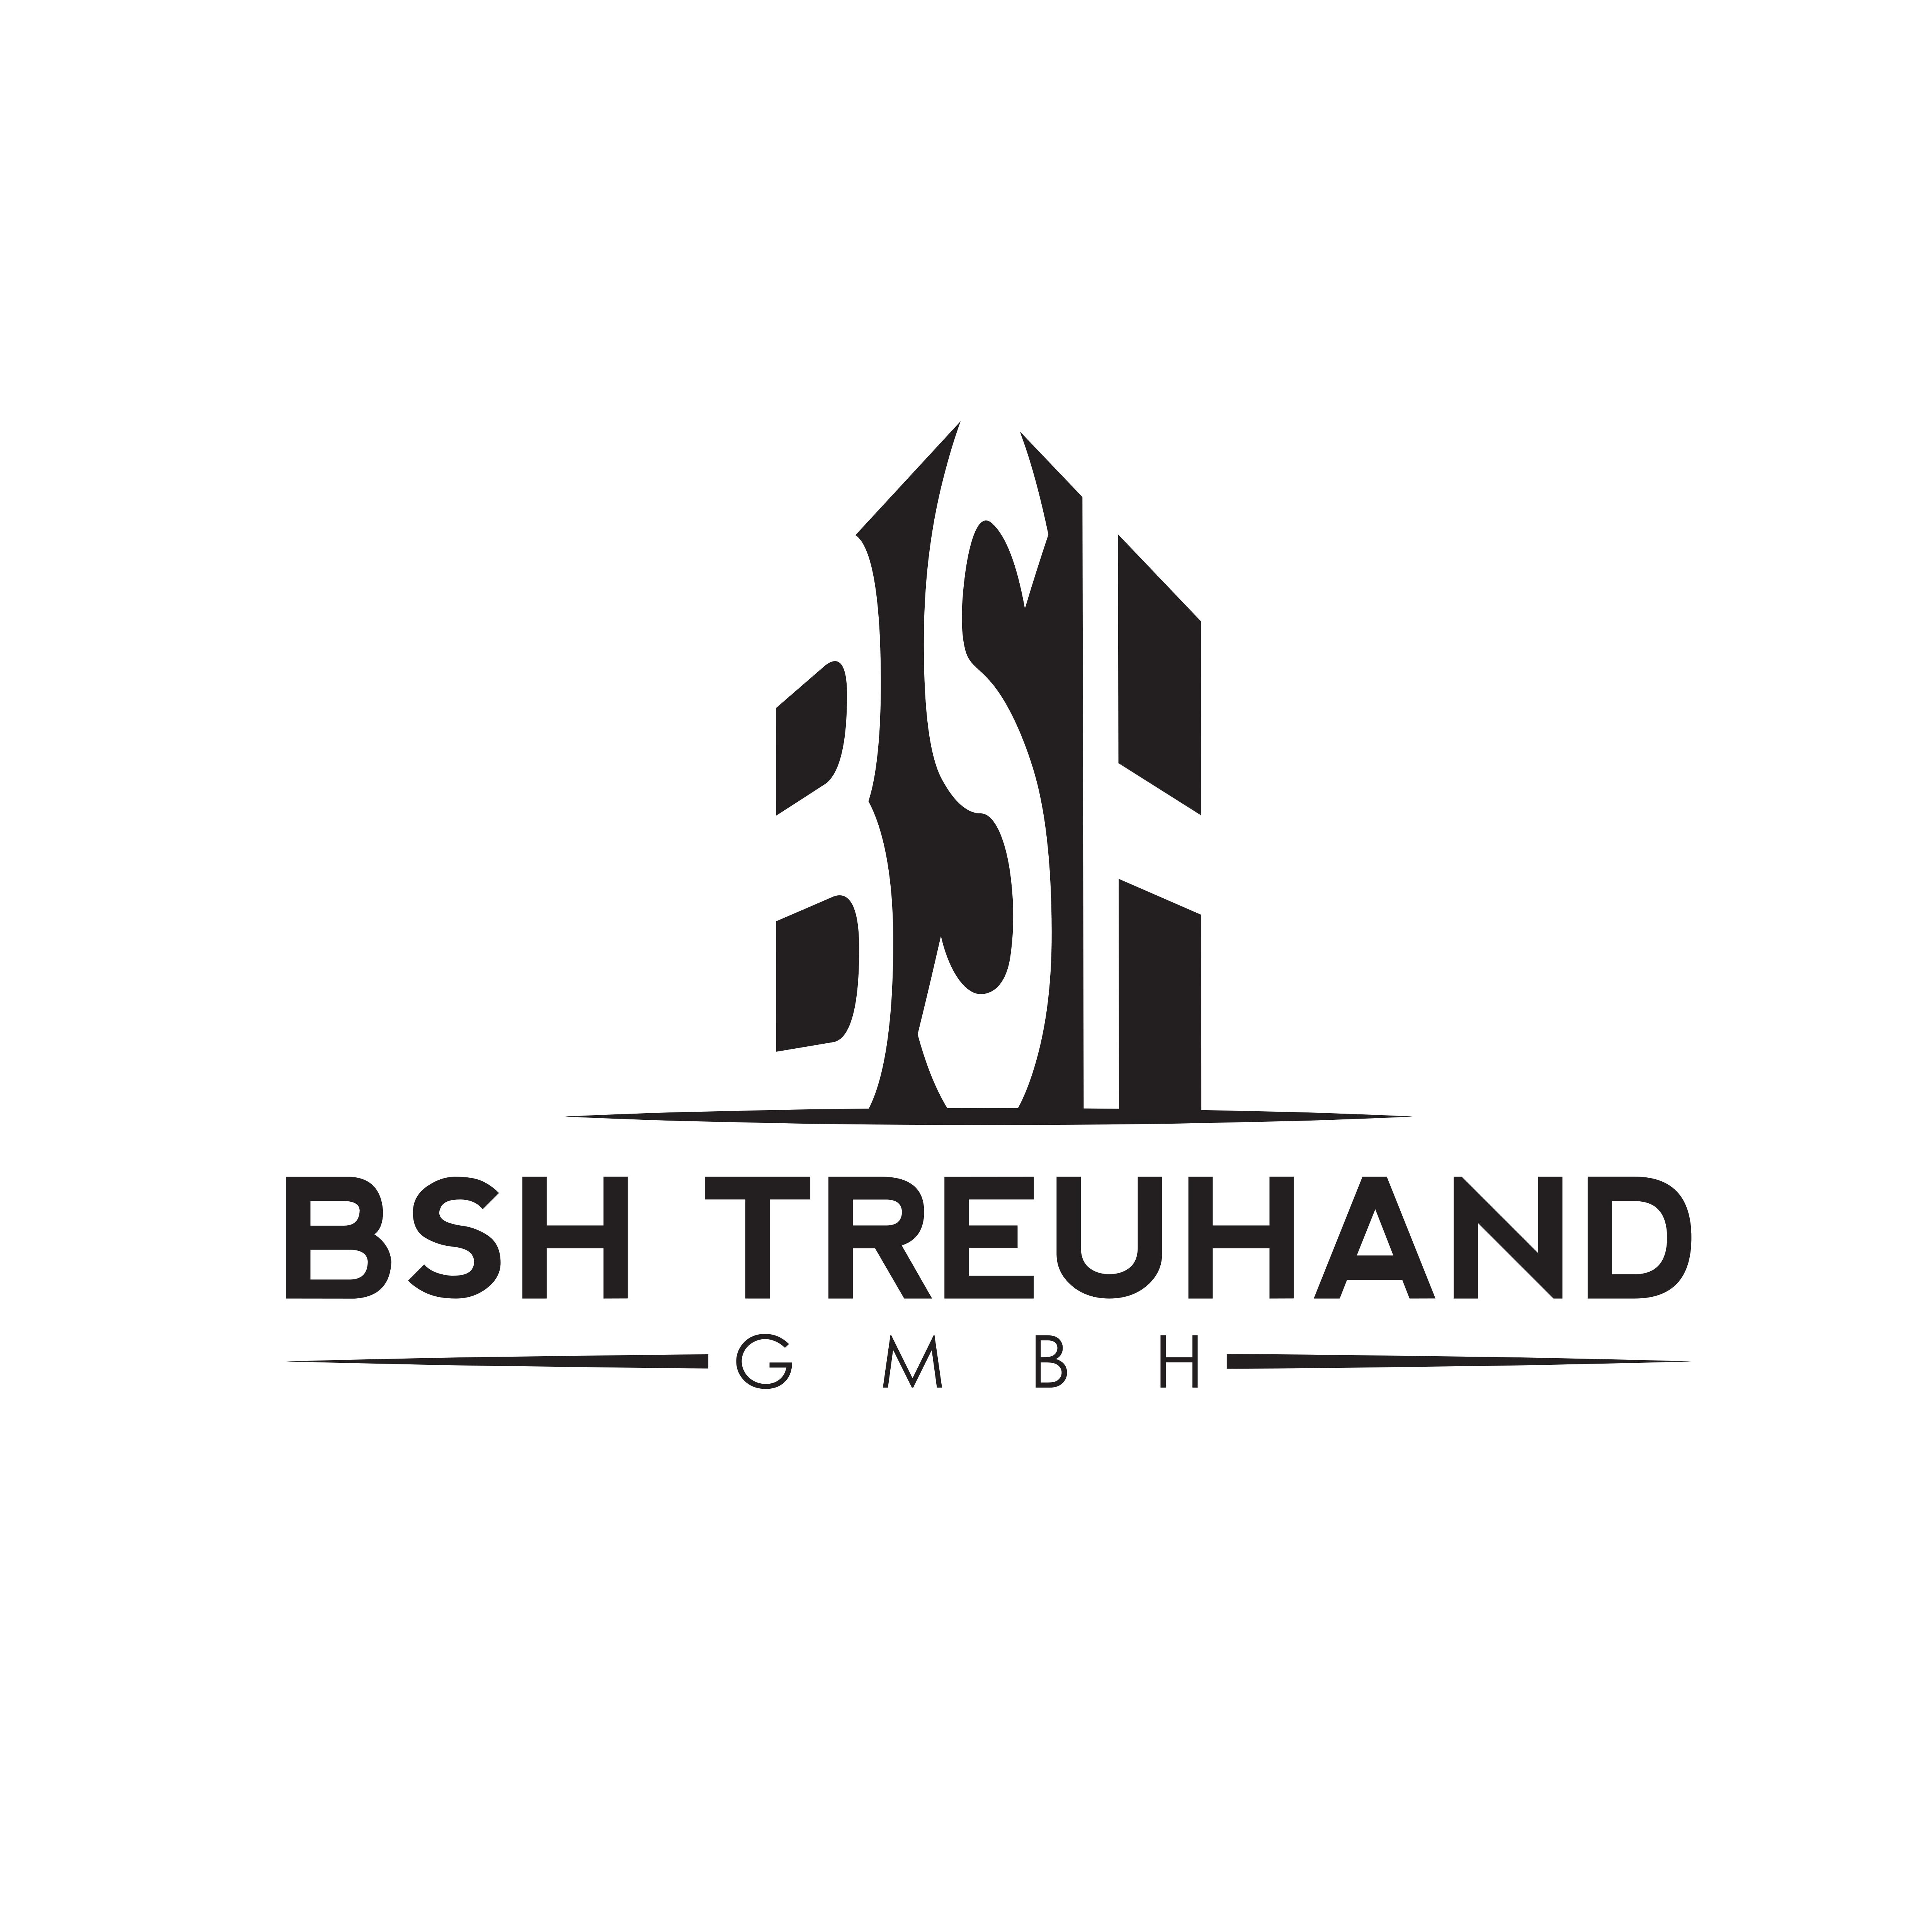 BSH Treuhand GmbH